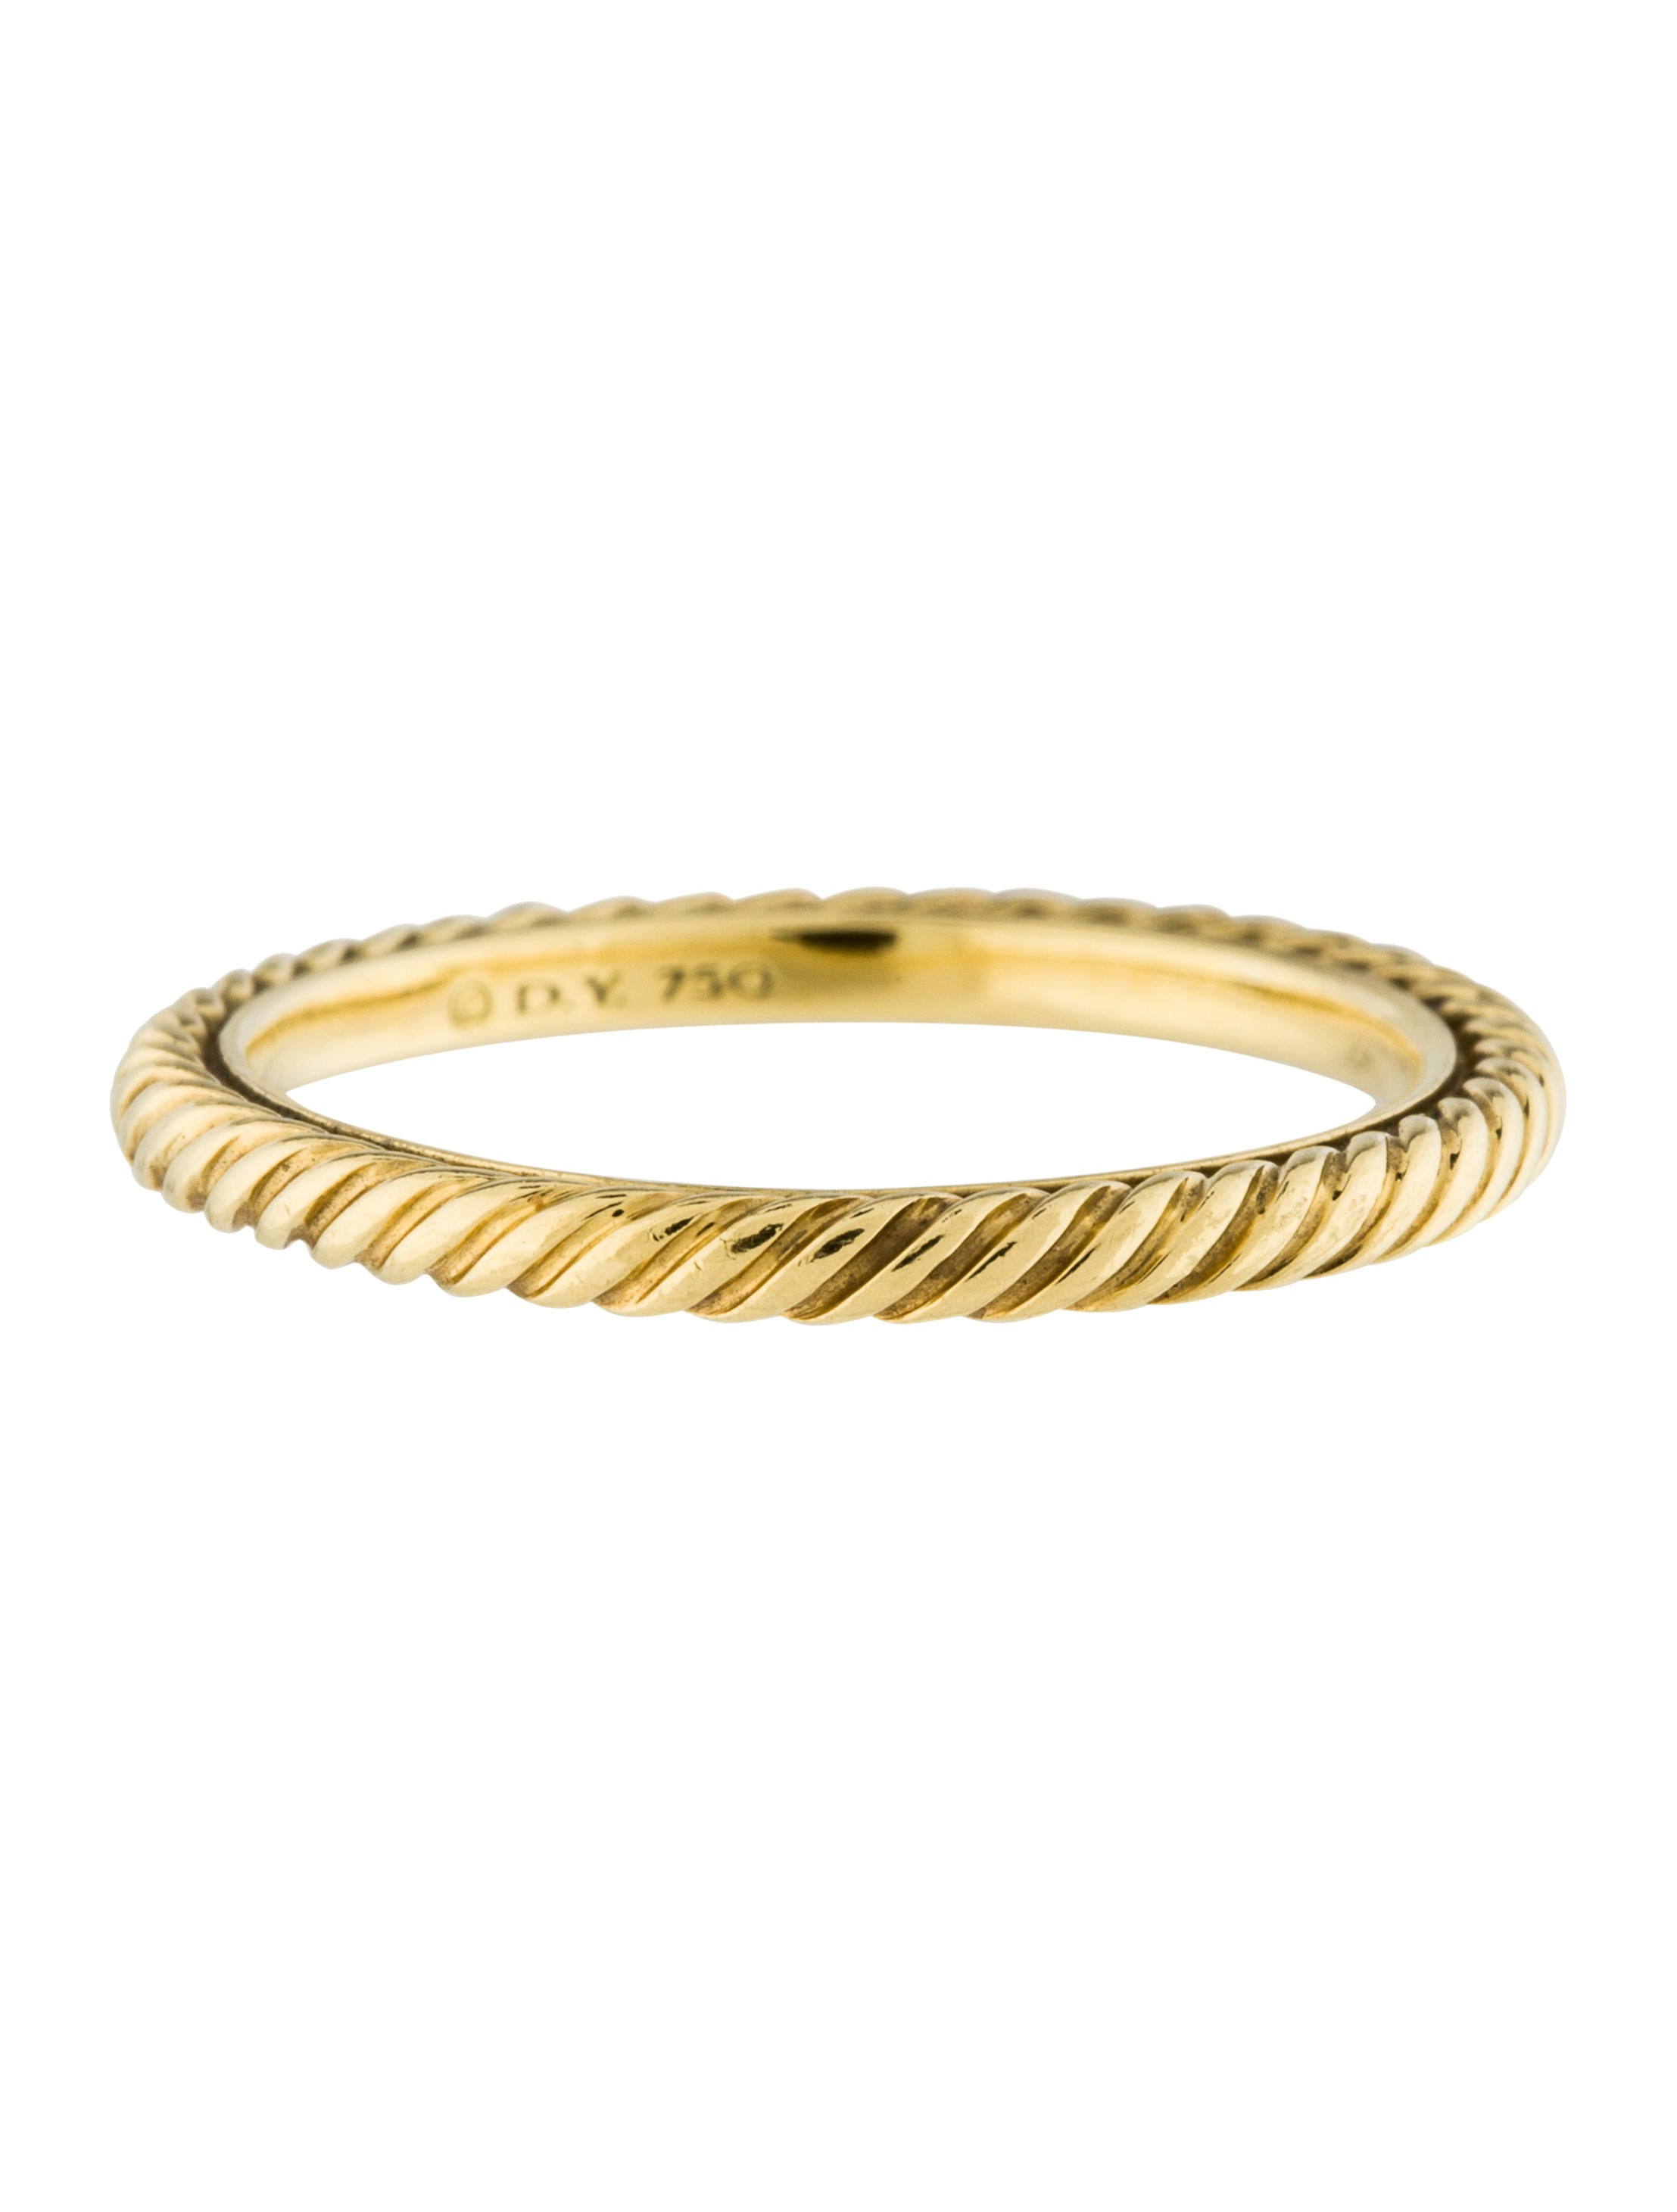 David yurman 18k cable classic band ring rings for David yurman inspired jewelry rings